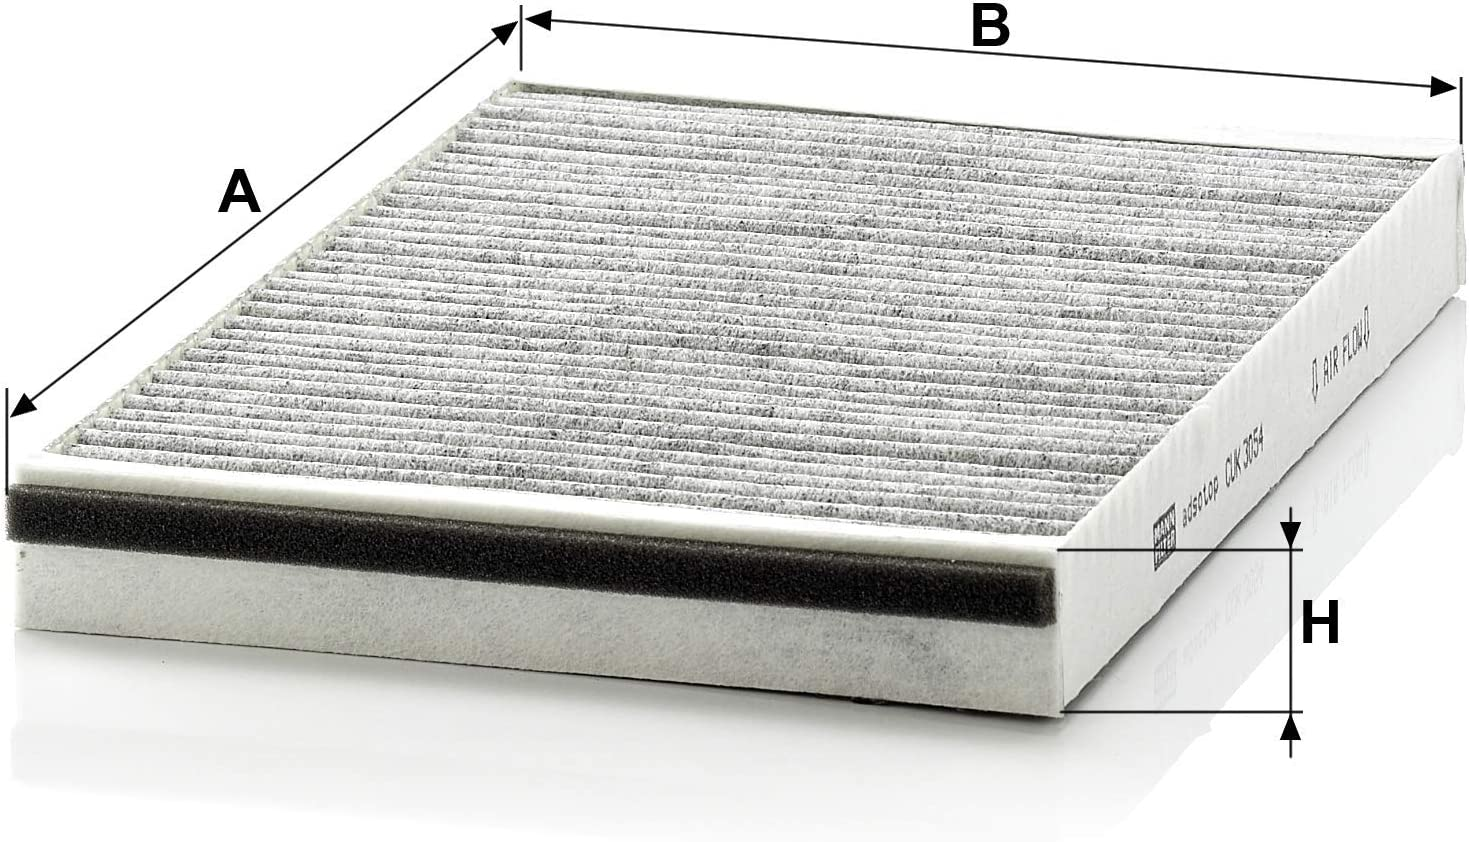 Original filtro MANN aire filtro polen filtro de cabina con carbón activado CUK 2442 Opel